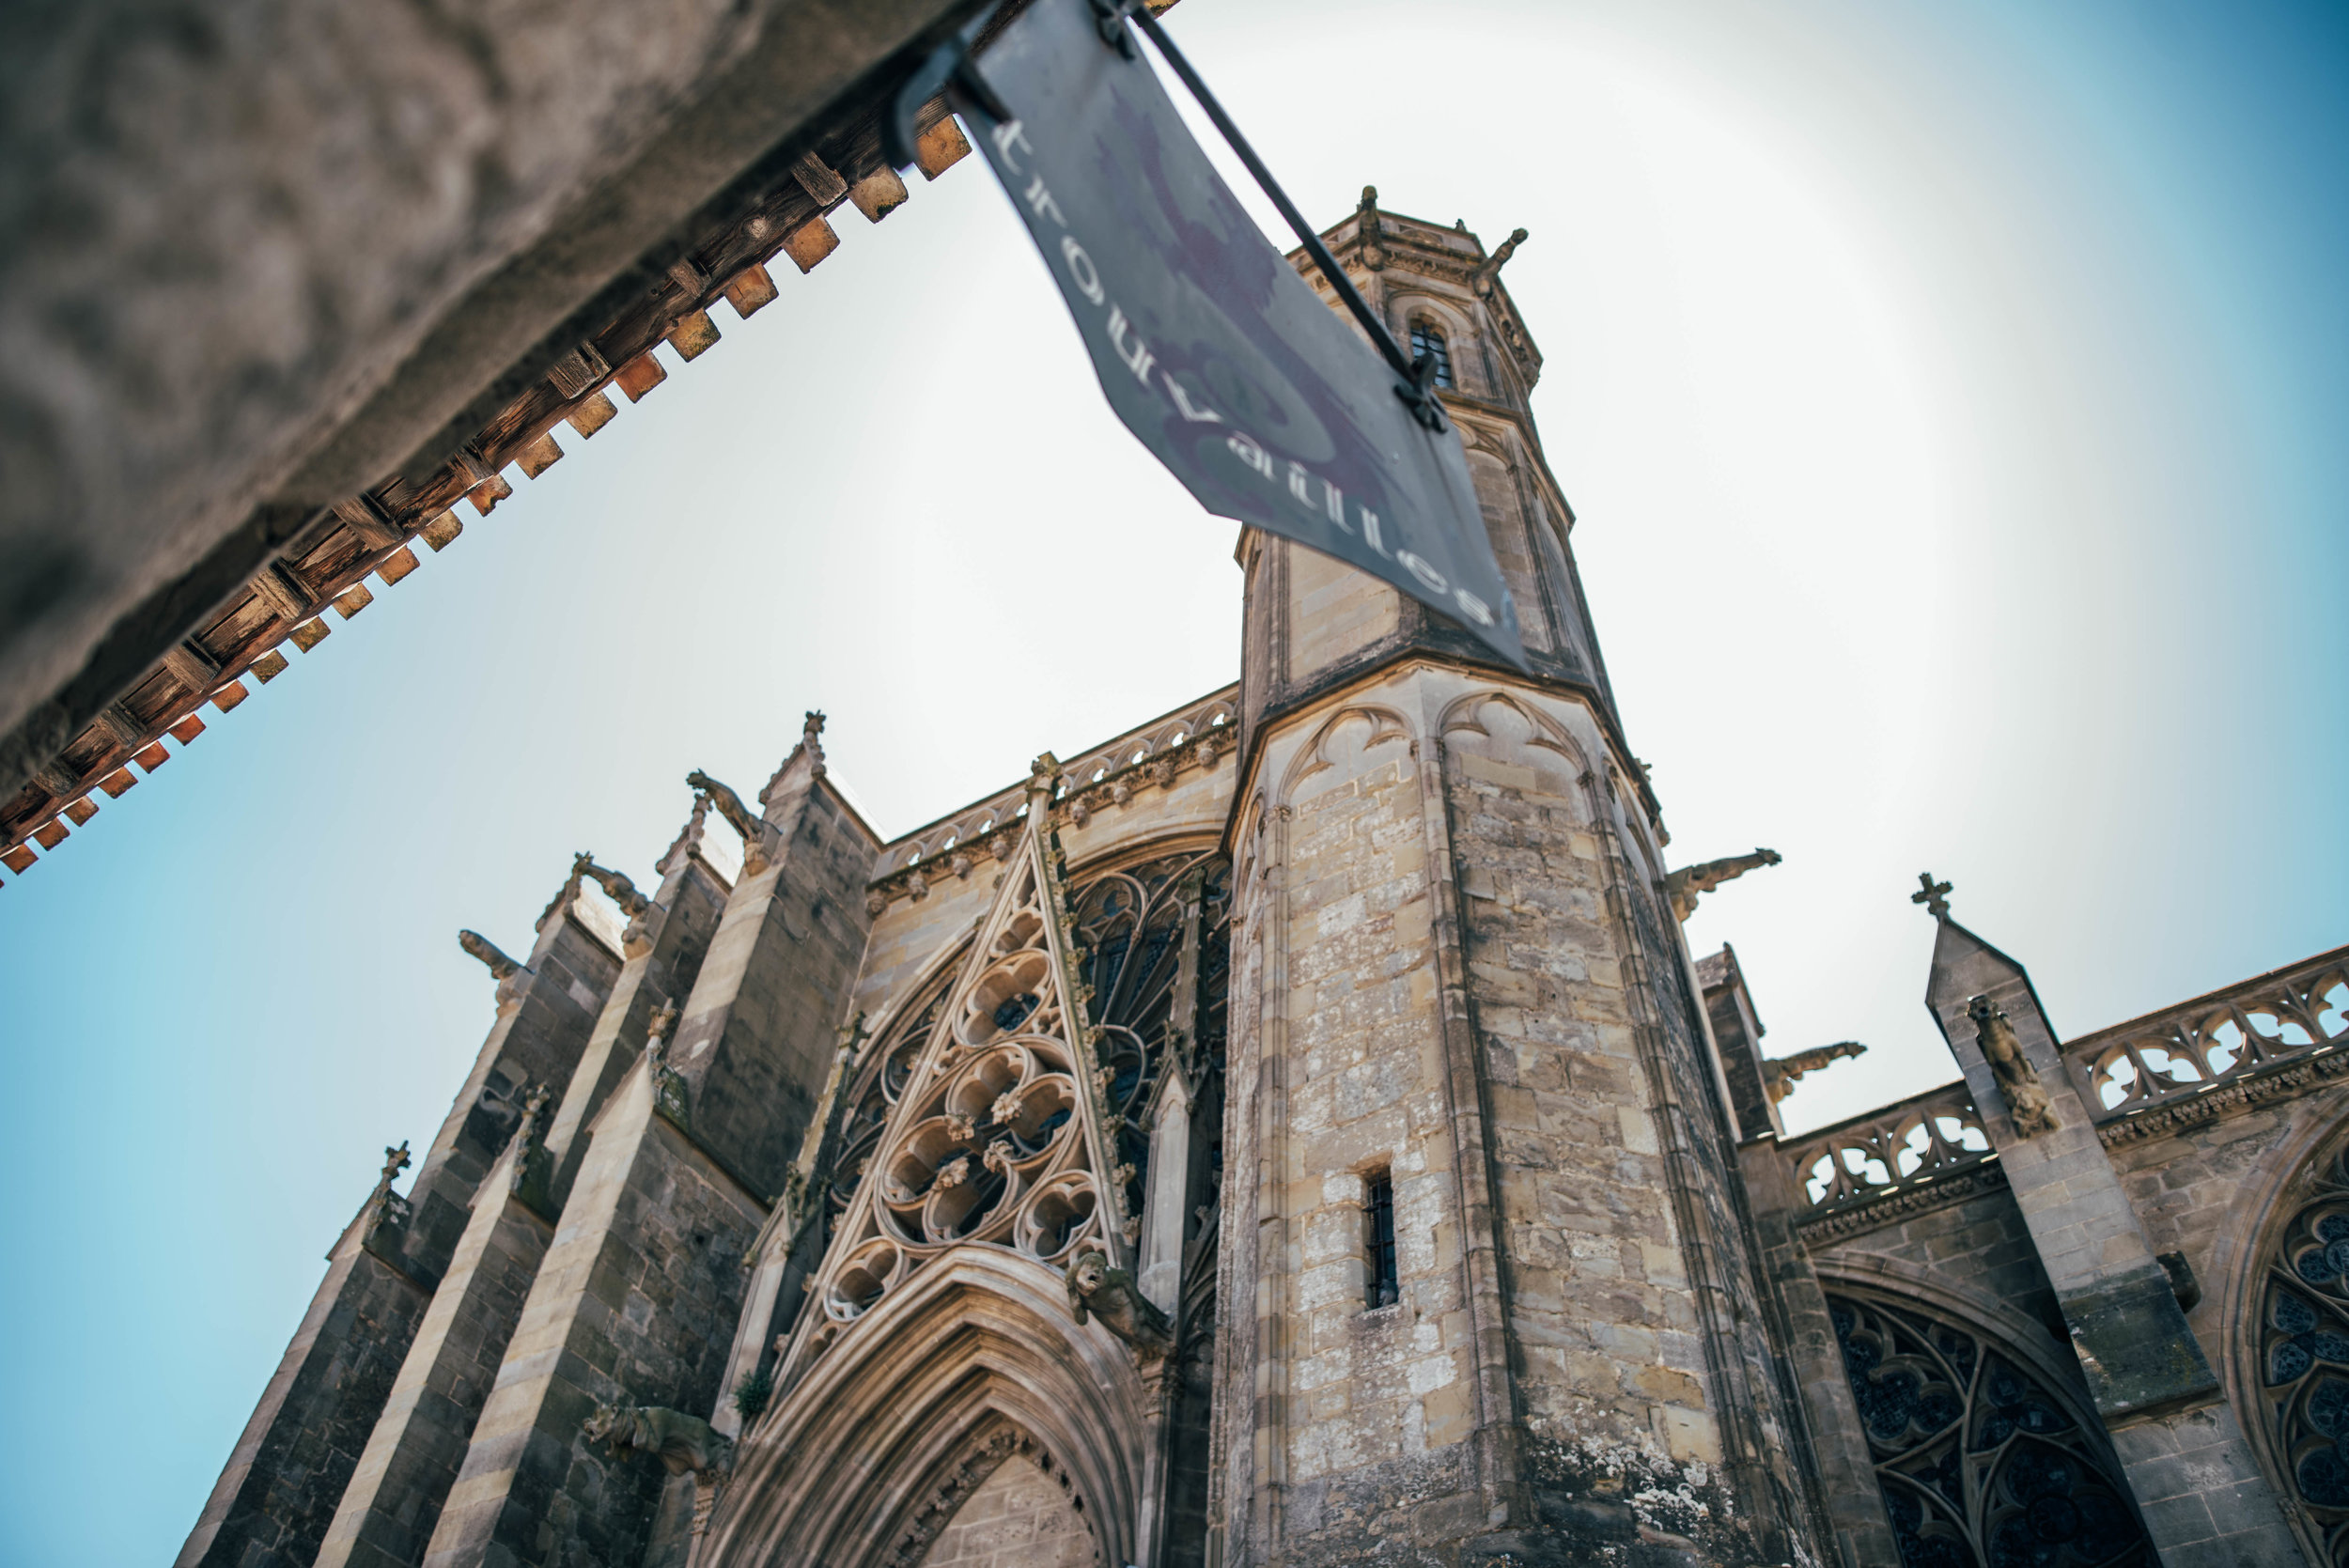 Basilique Saint Nazaire Carcassonne Citadel France Essex UK Documentary Photographer